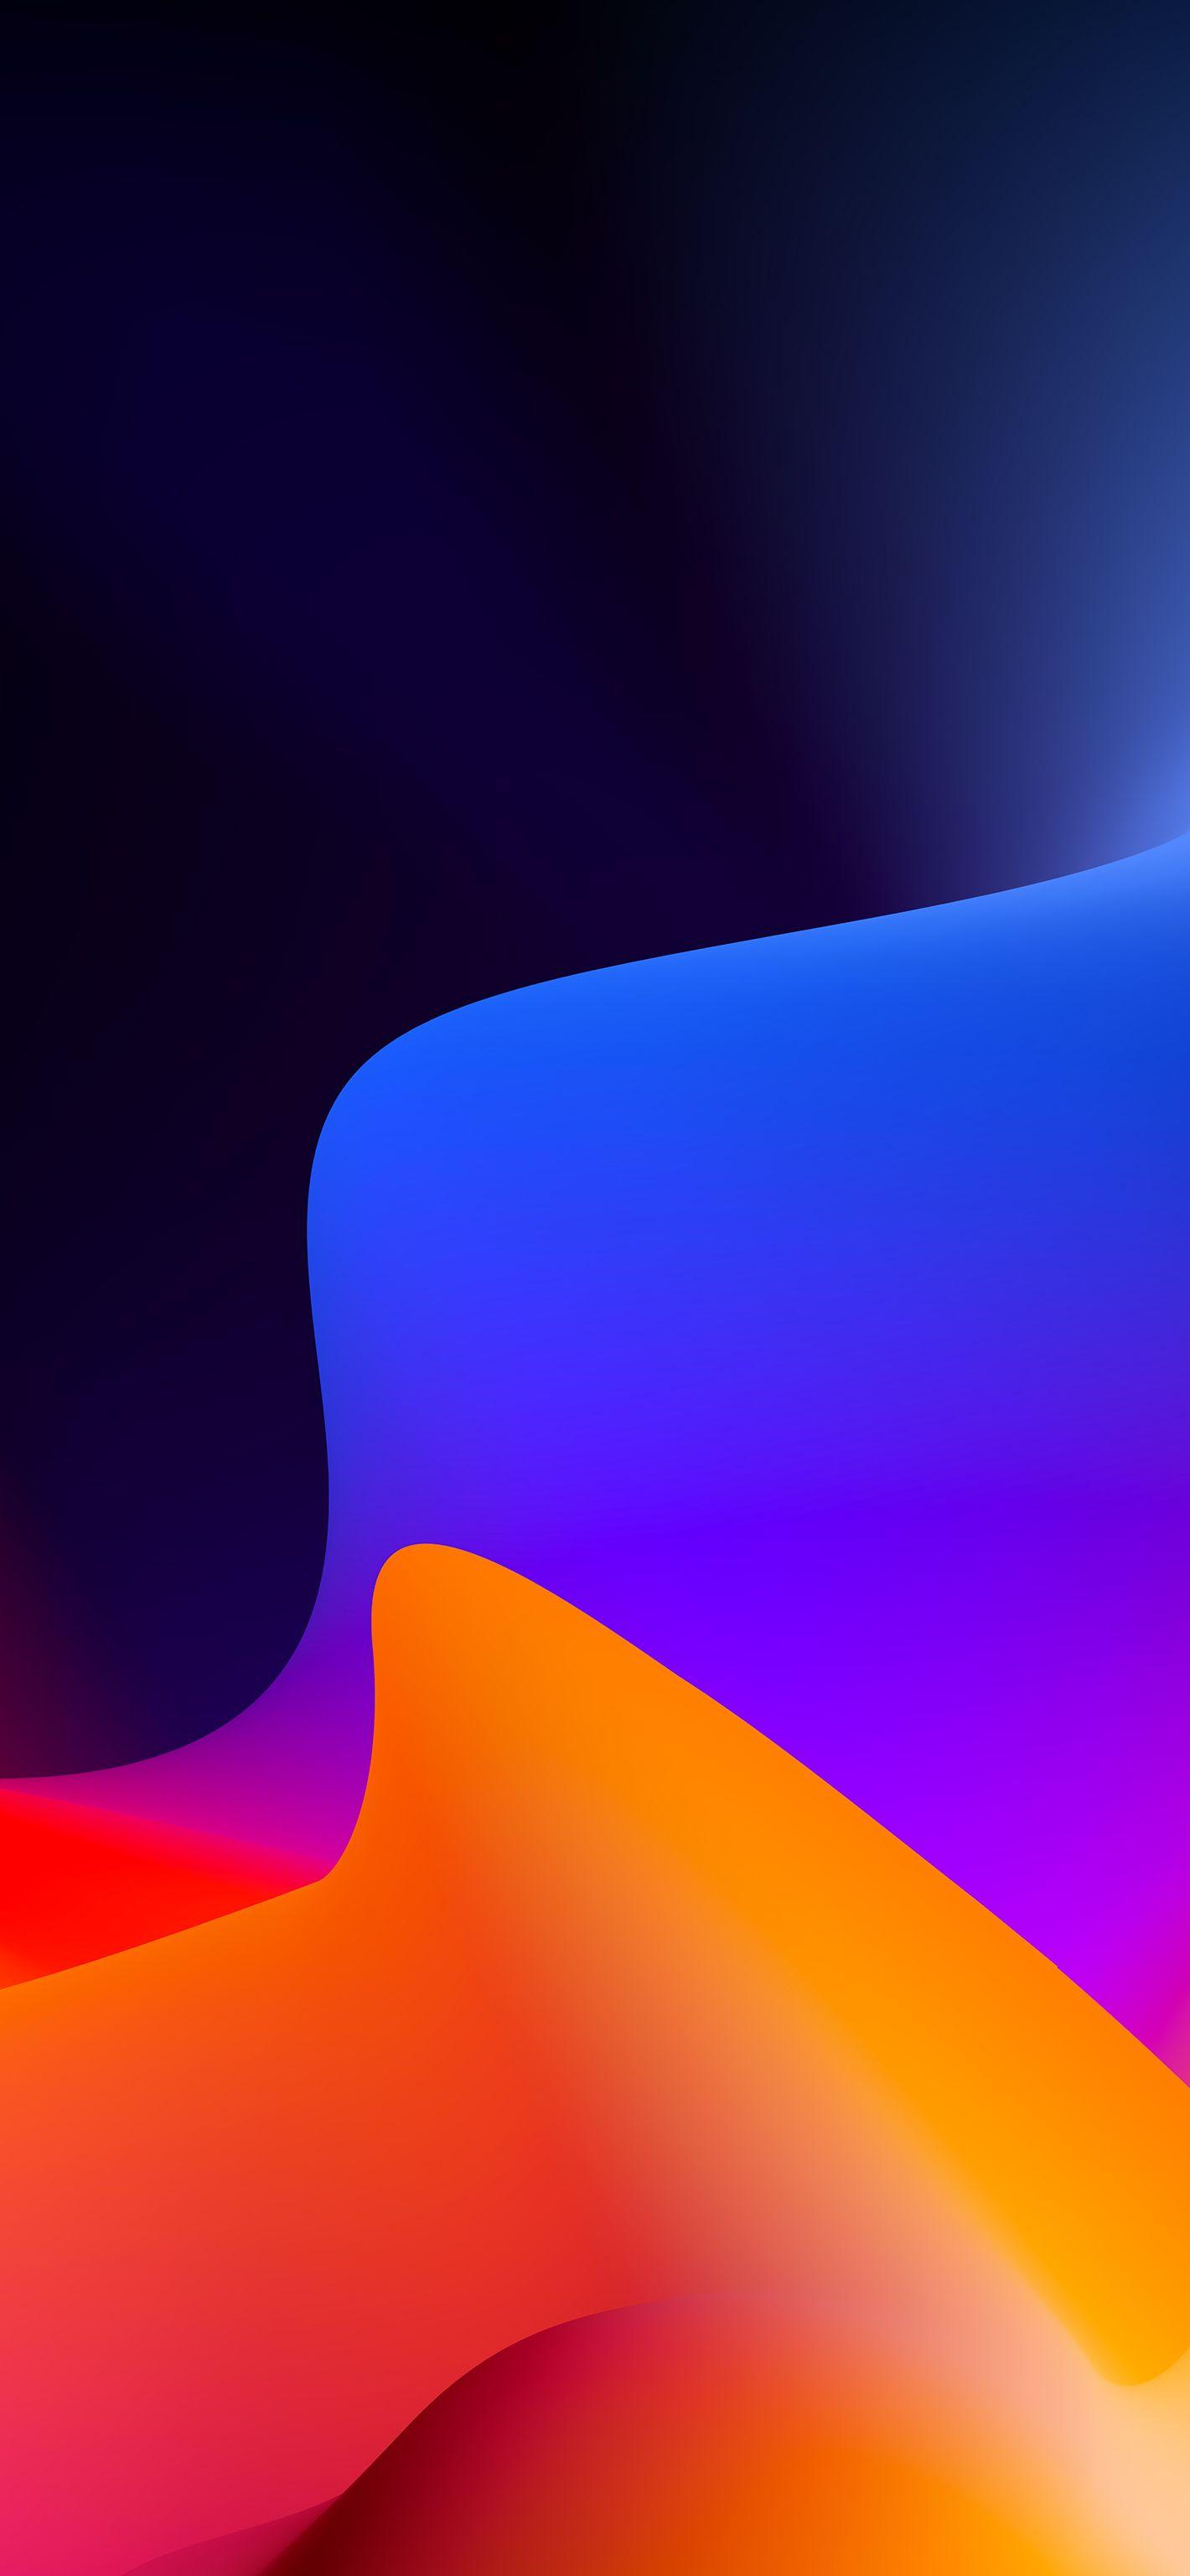 ios wallpaper iphone